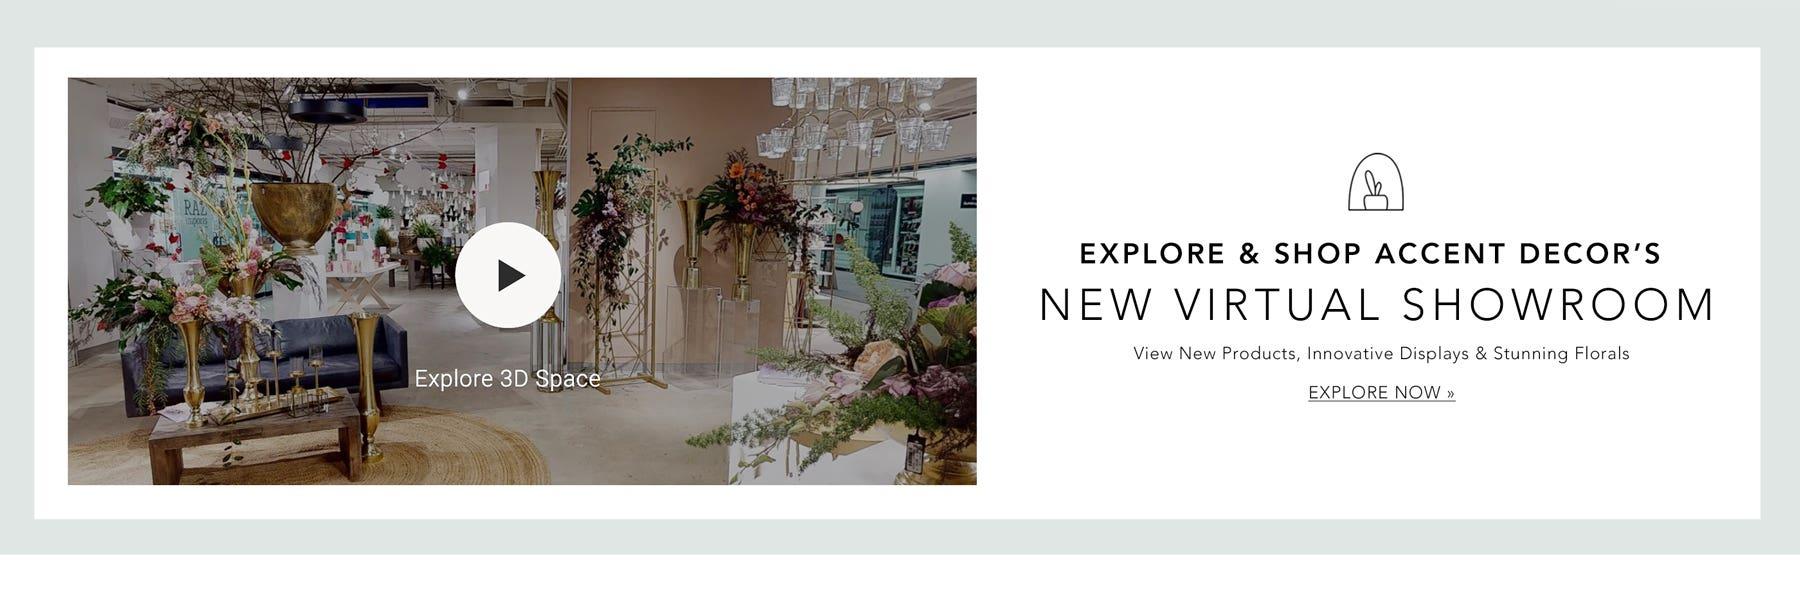 Explore & Shop Accent Decor's New Virtual Showroom